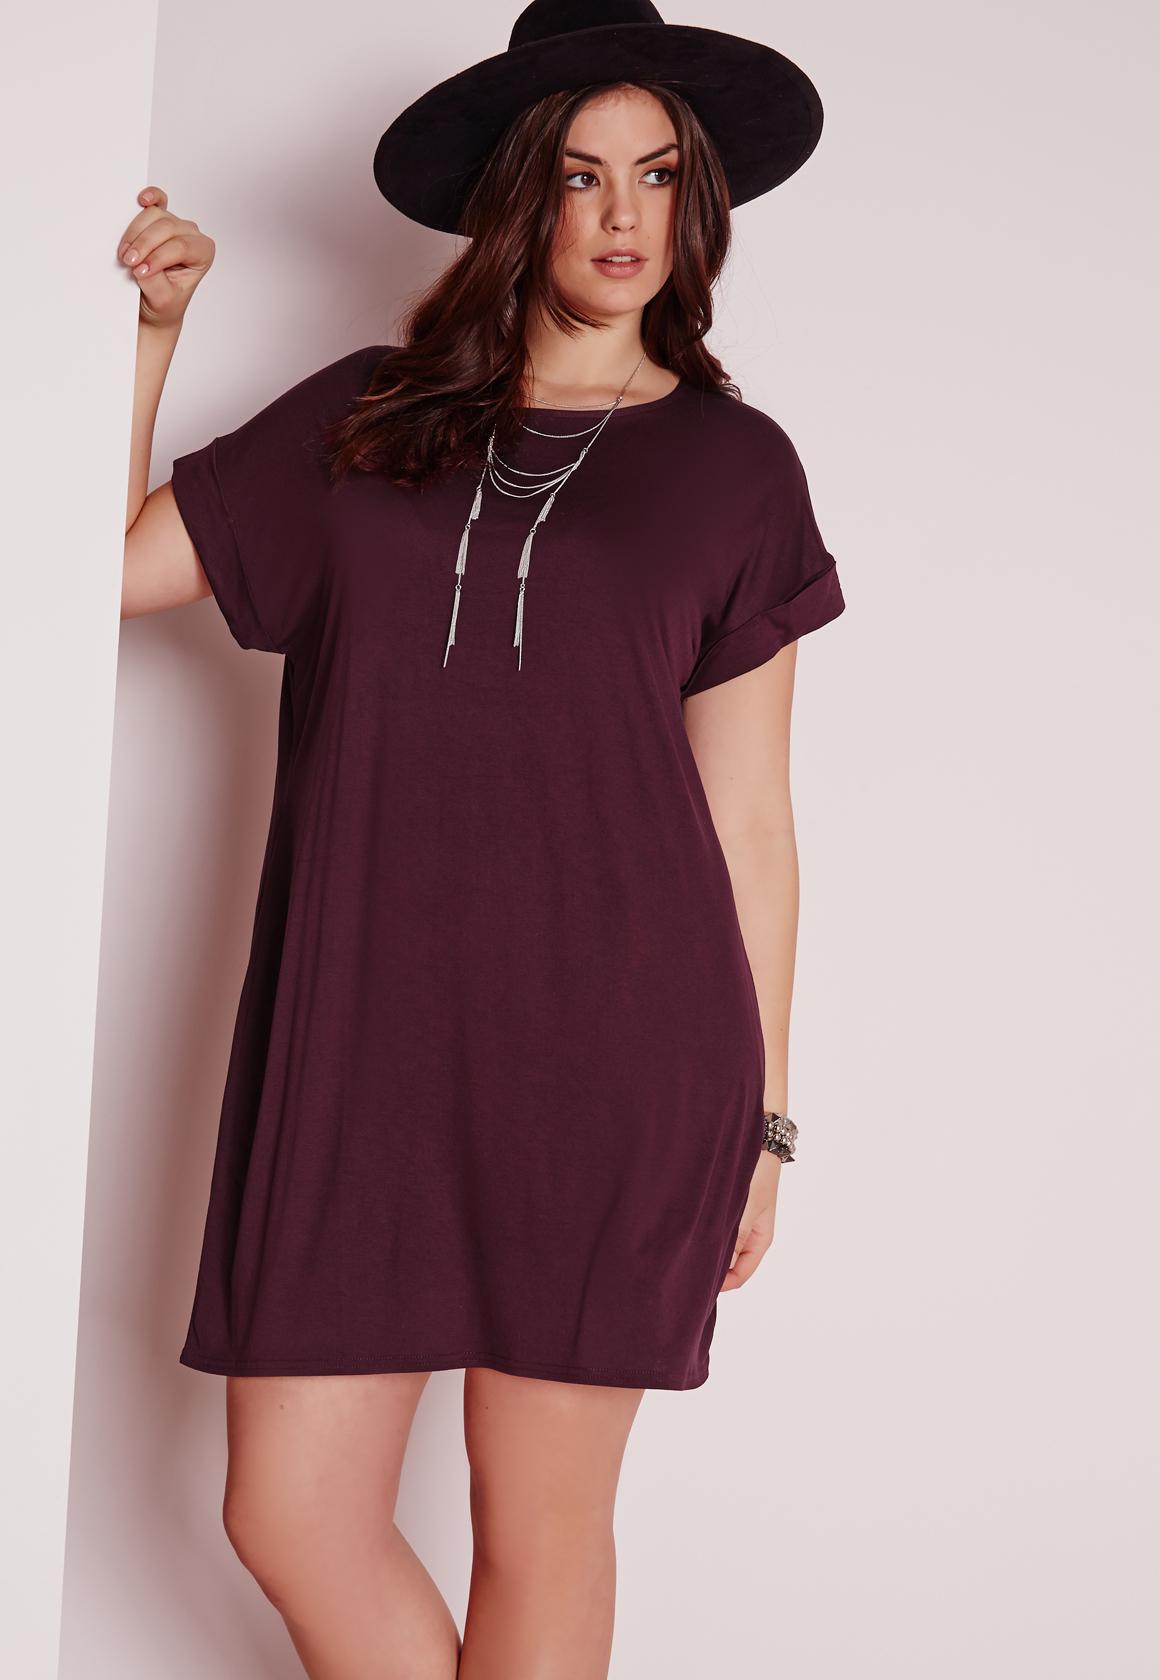 a746acf8b71a Lyst - Missguided Plus Size T-shirt Dress Purple in Purple